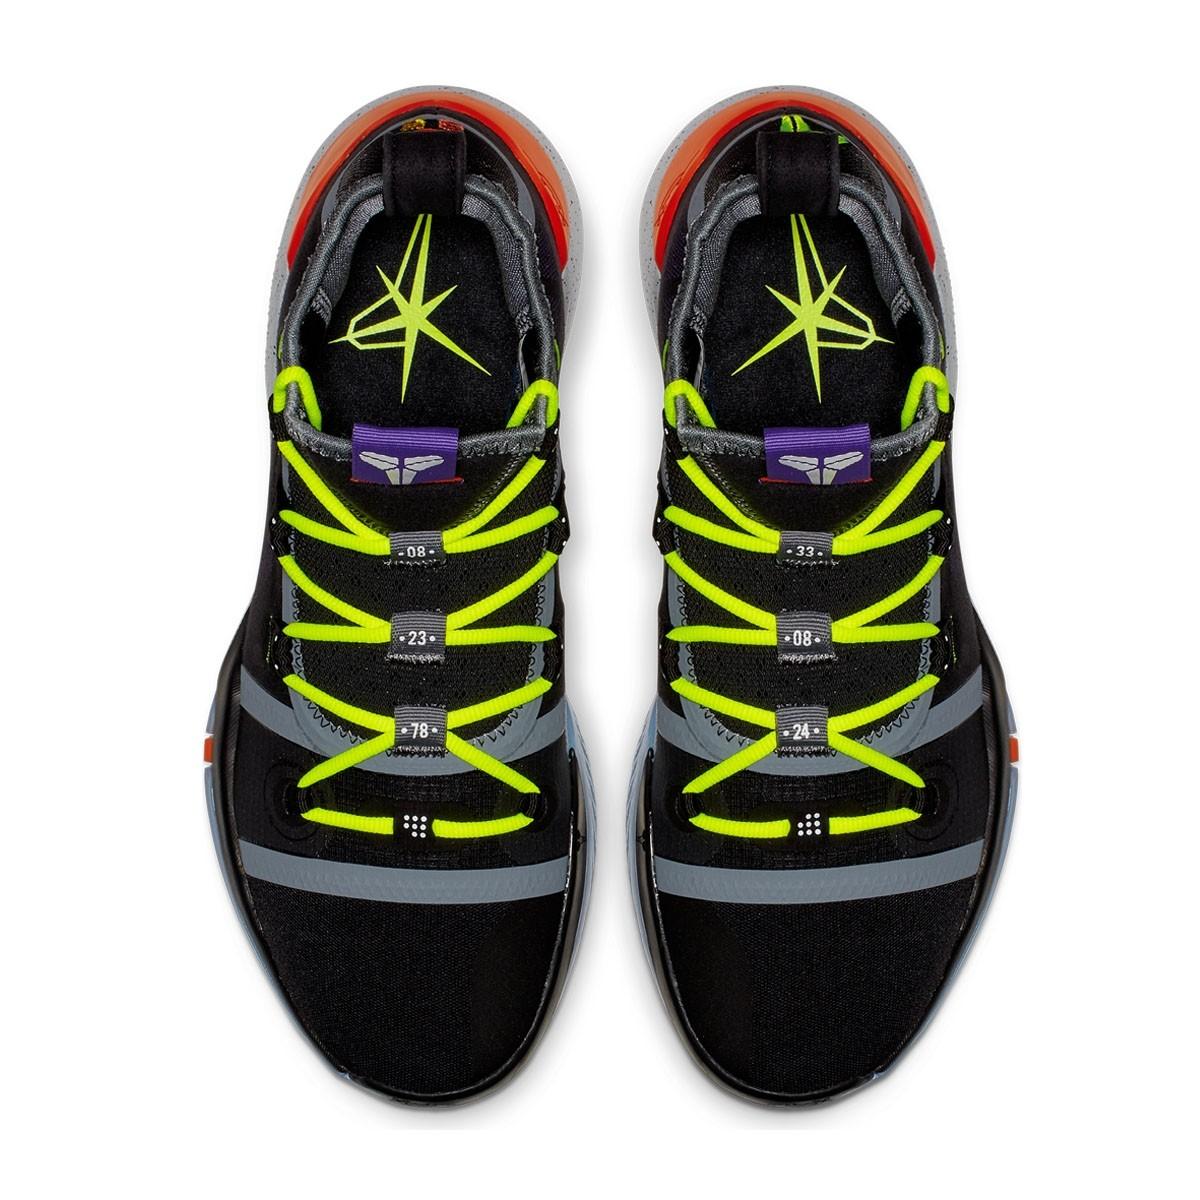 6ac63d8f643 Buy Nike Kobe AD Exodus  Racer Blue  Basketball shoes   sneakers